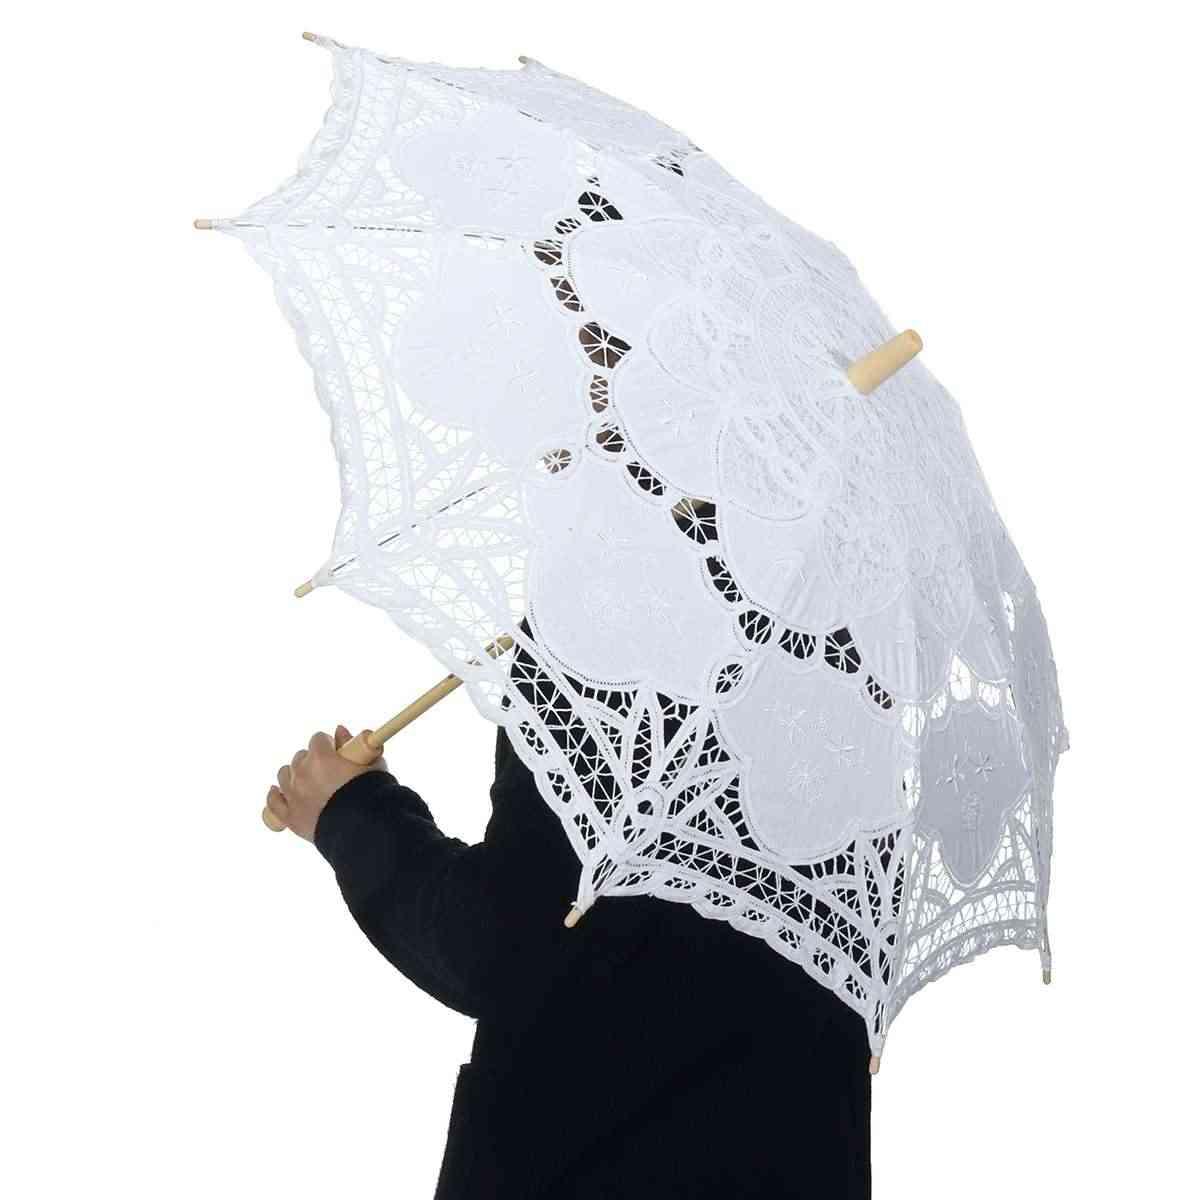 Elegant Embroidered Lace Cotton Umbrella